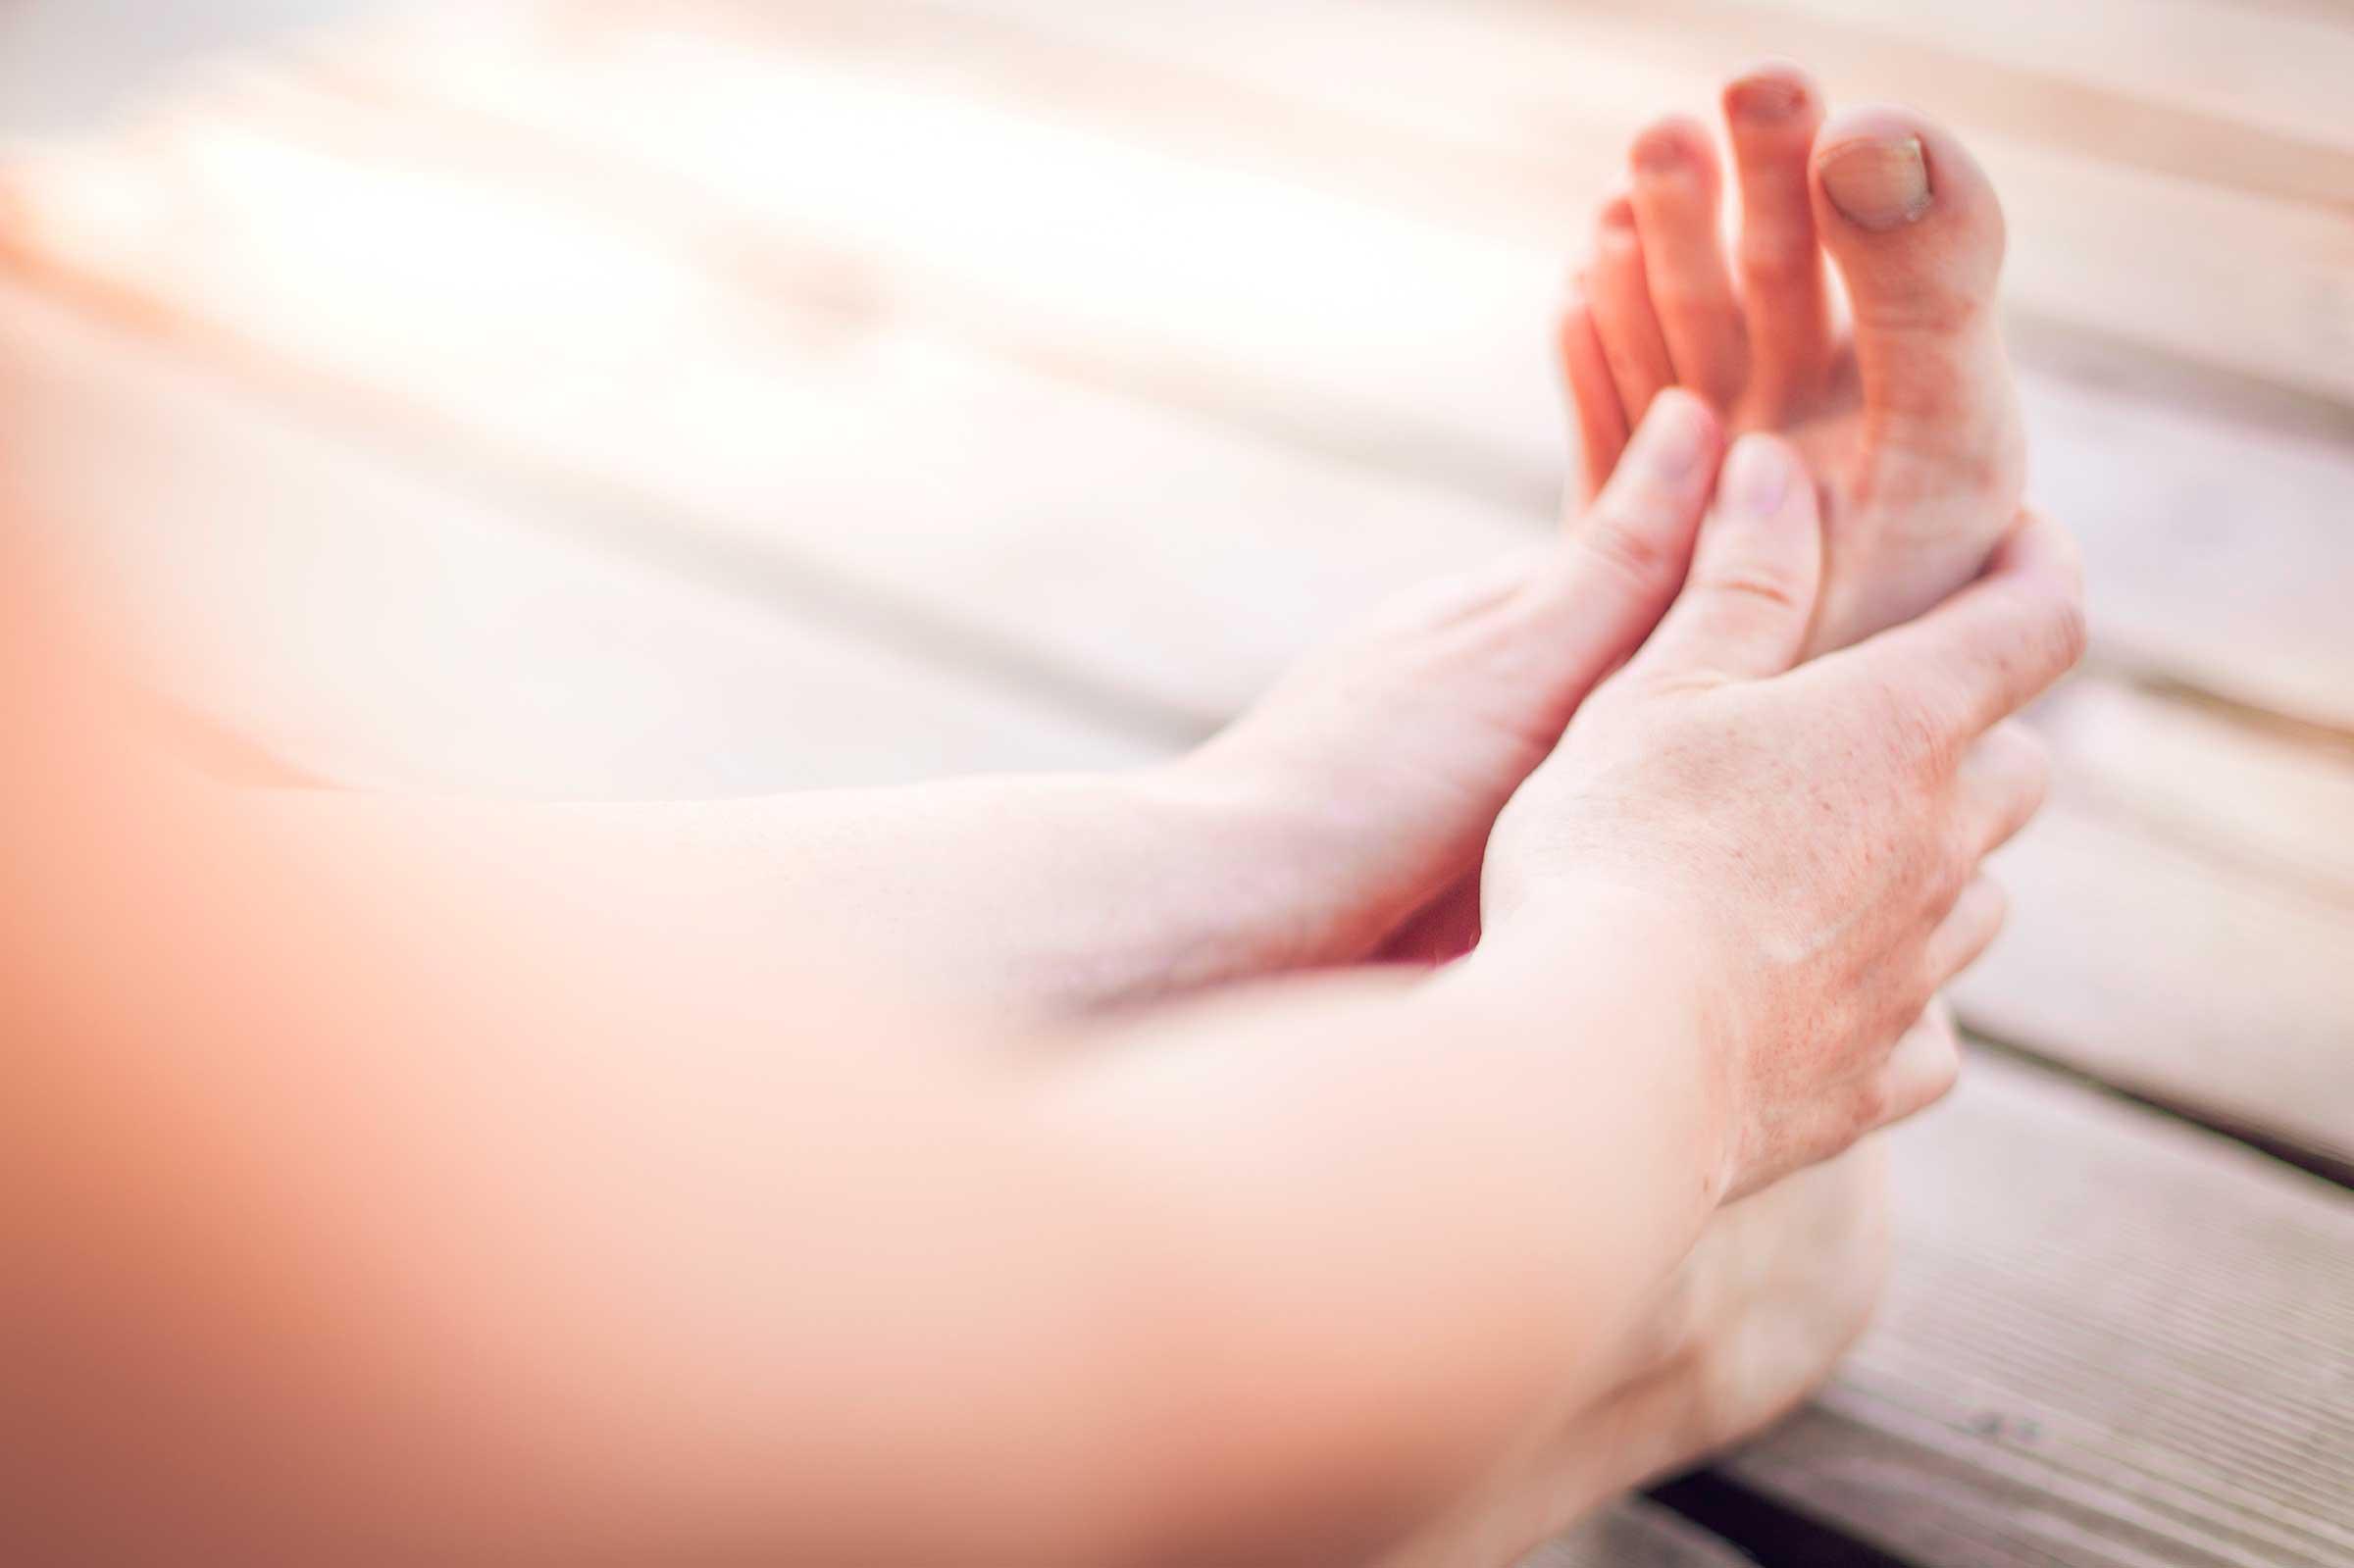 01-healthy-feet-tips-diabetes-nightly-foot-check